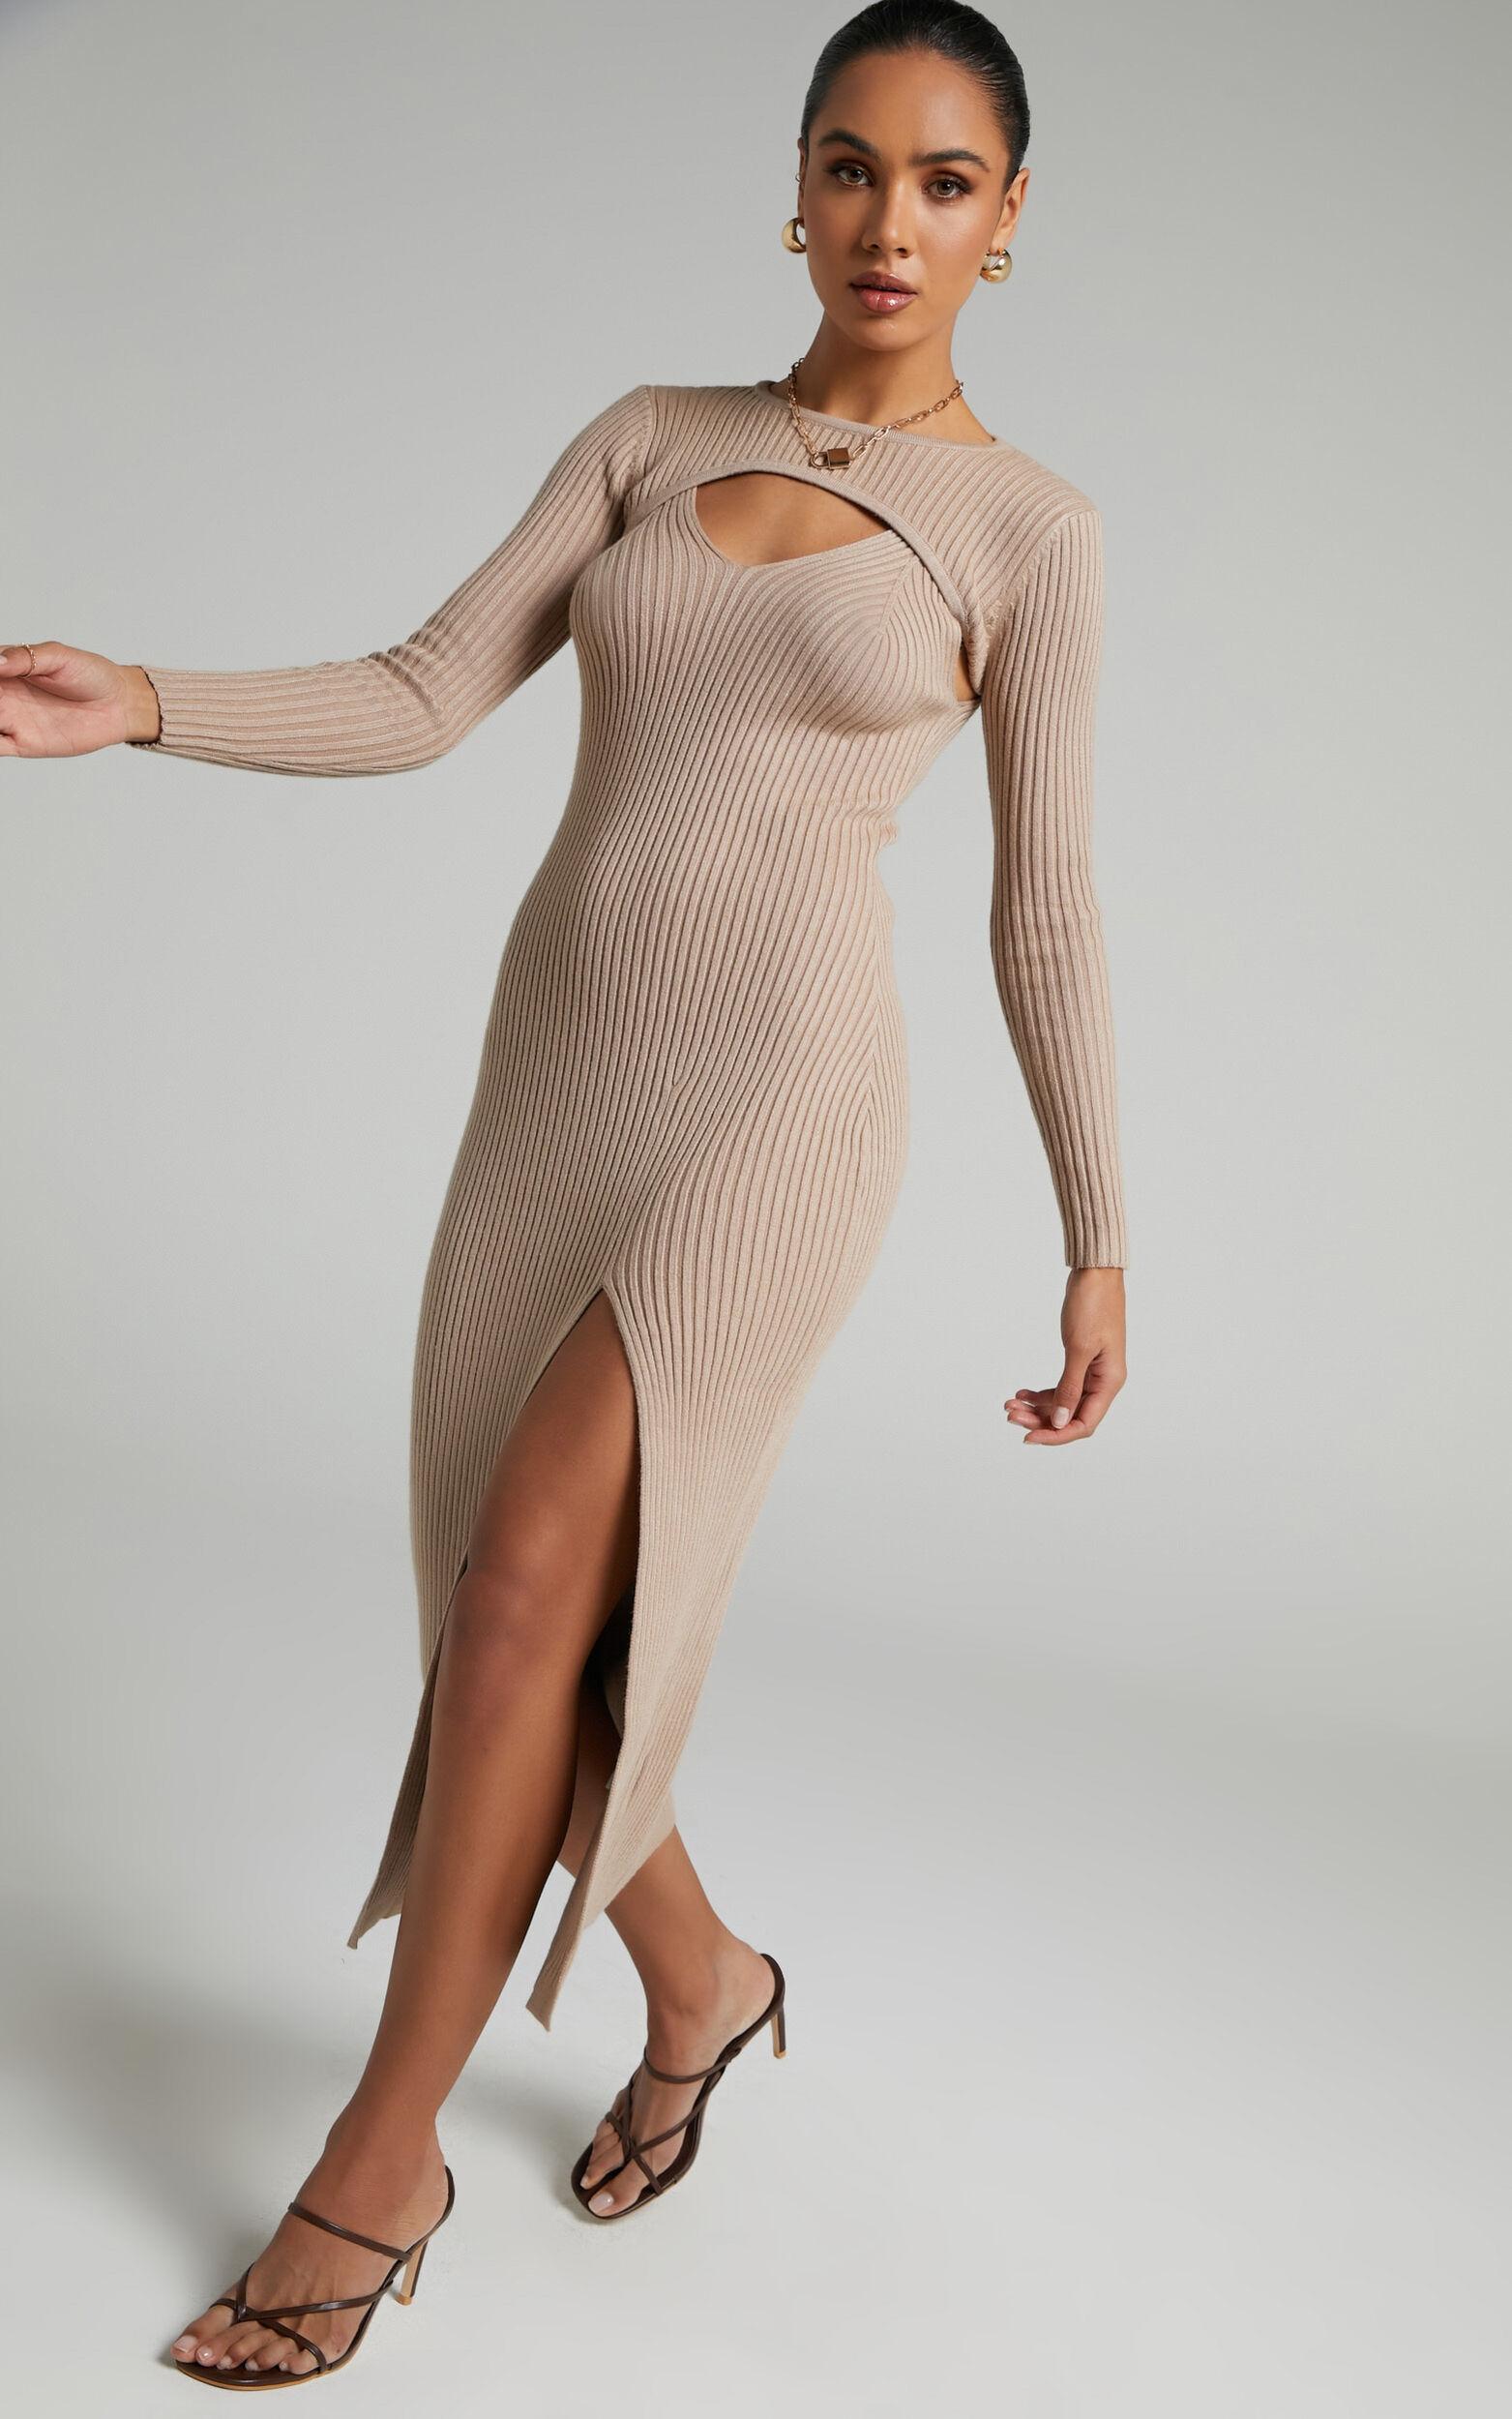 Codie Knit Dress in Beige - 06, BRN2, super-hi-res image number null